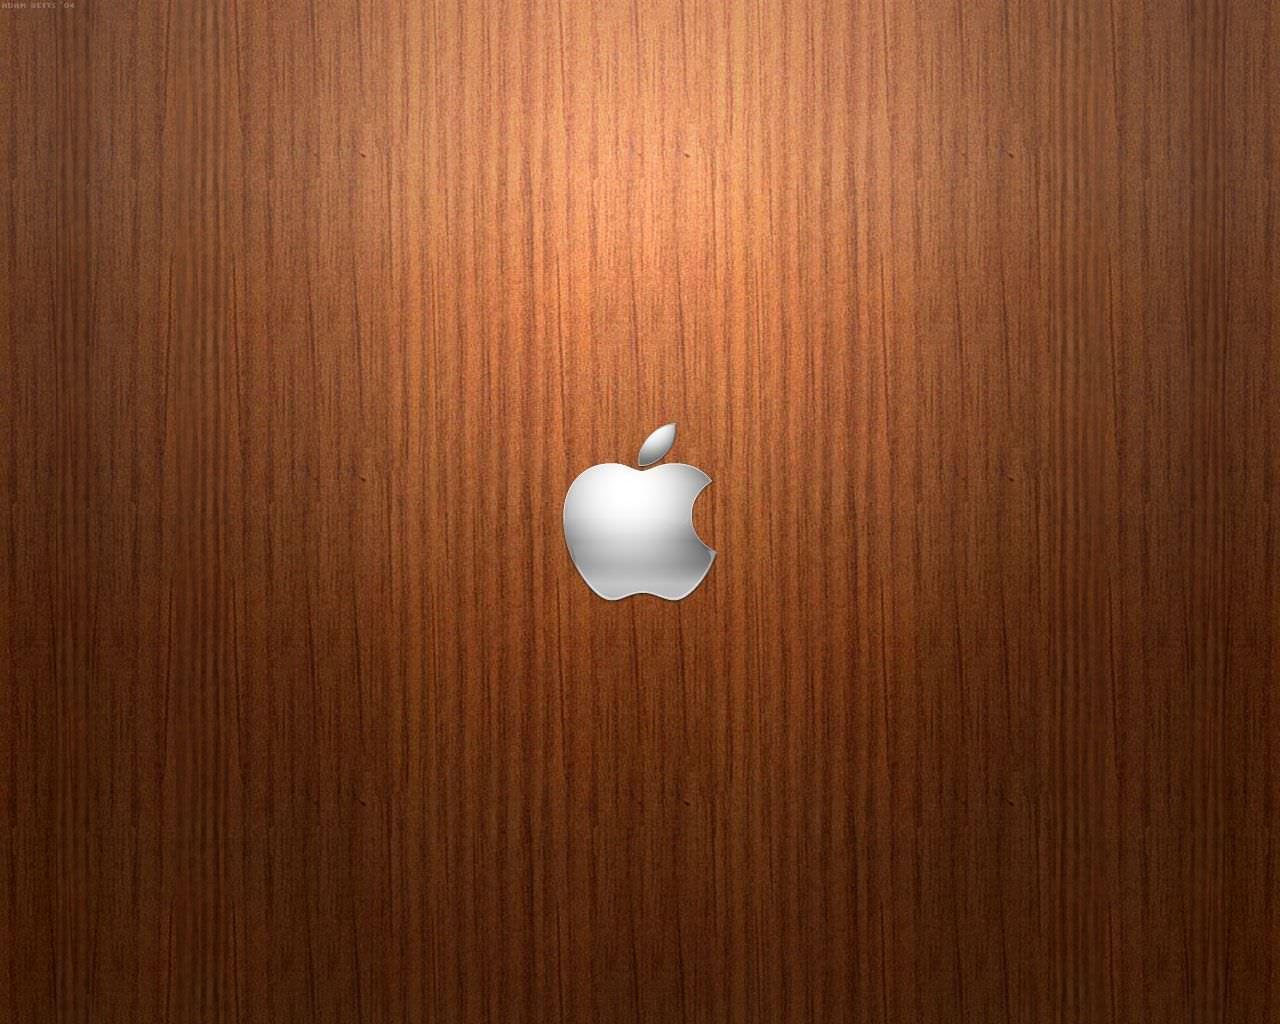 Brown Apple Logo Wallpaper For Mac